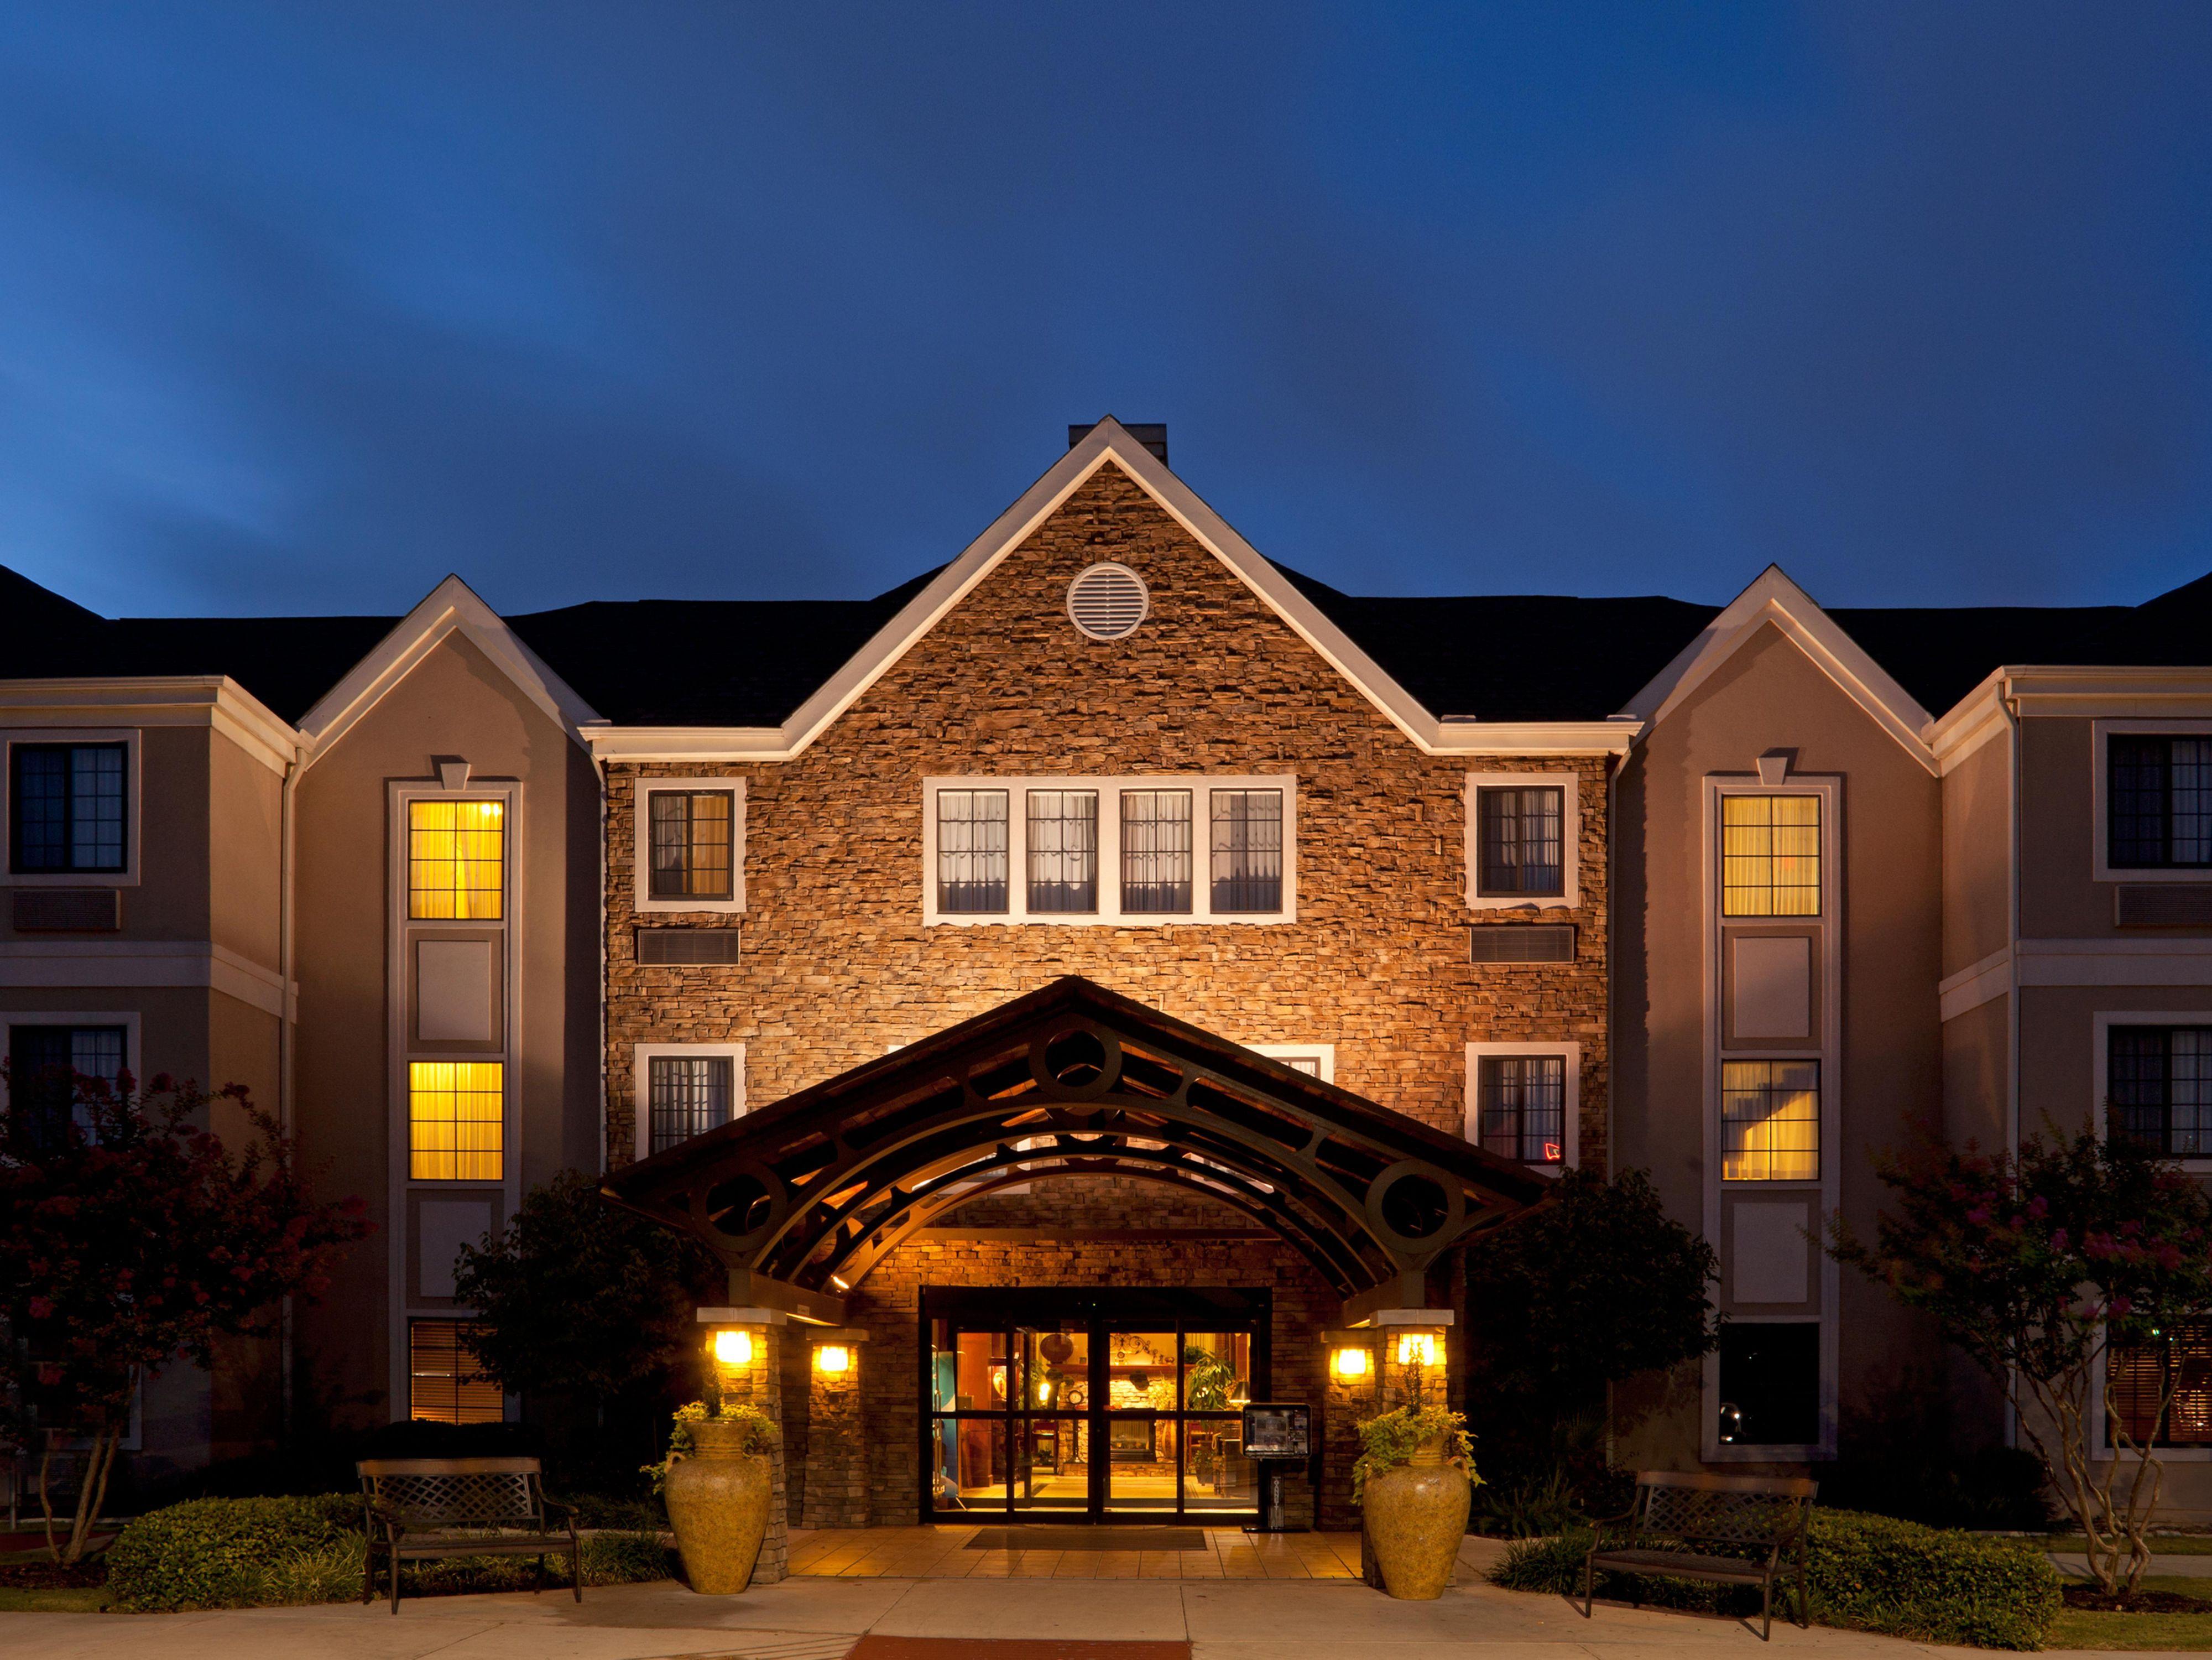 Hotel Suites in San Antonio, TX | Staybridge Suites San Antonio NW